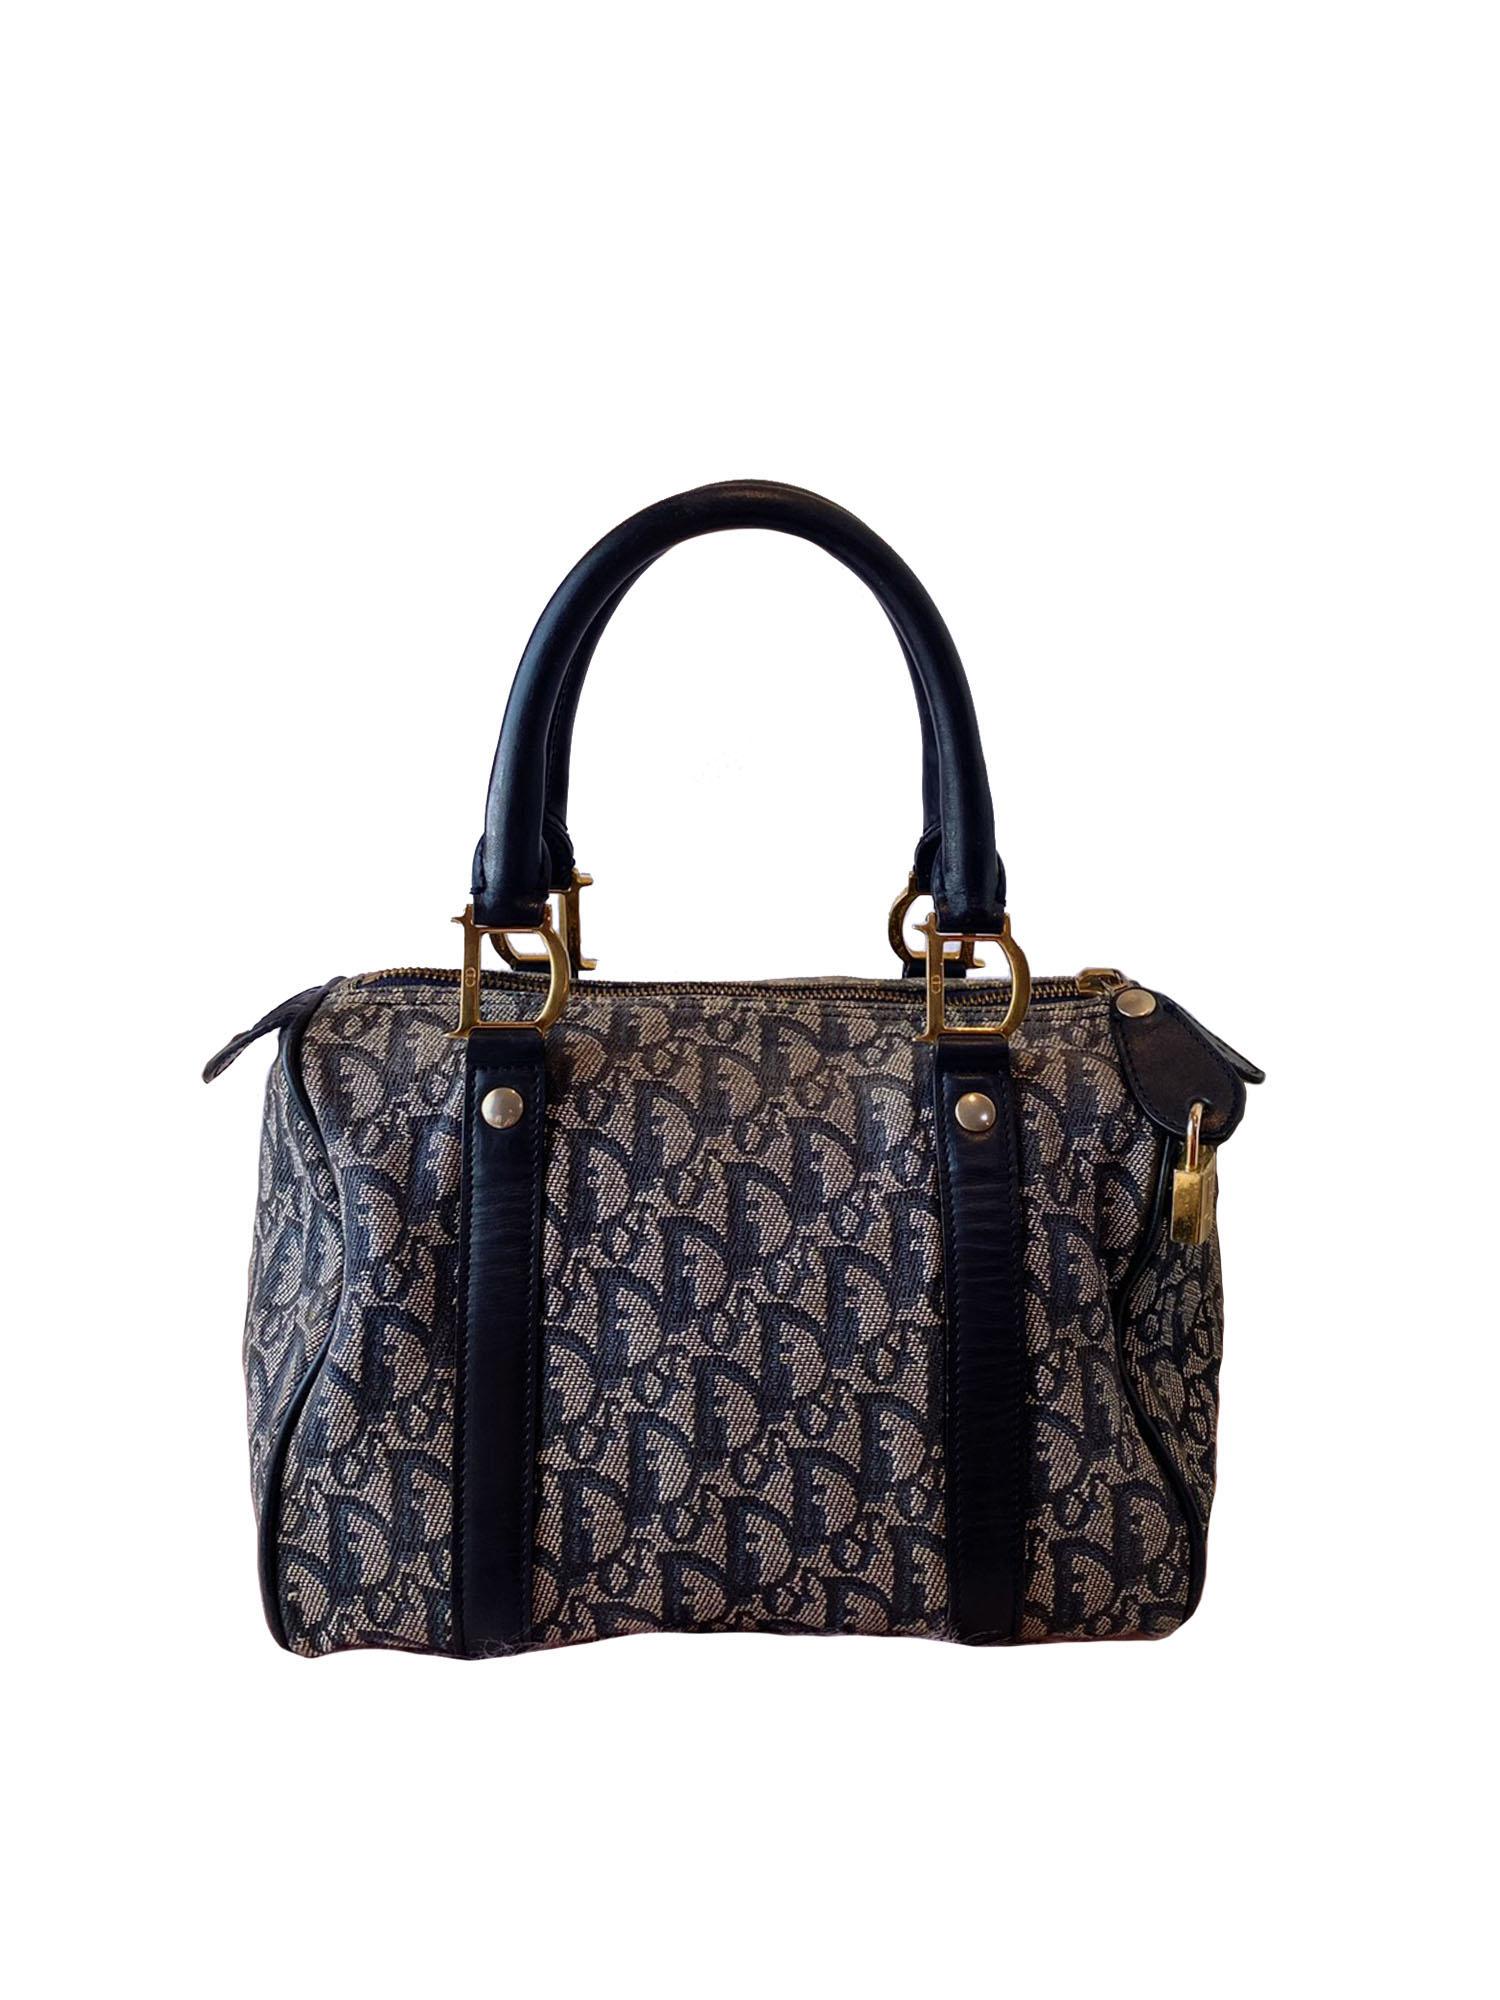 Christian Dior Boston Bag 25